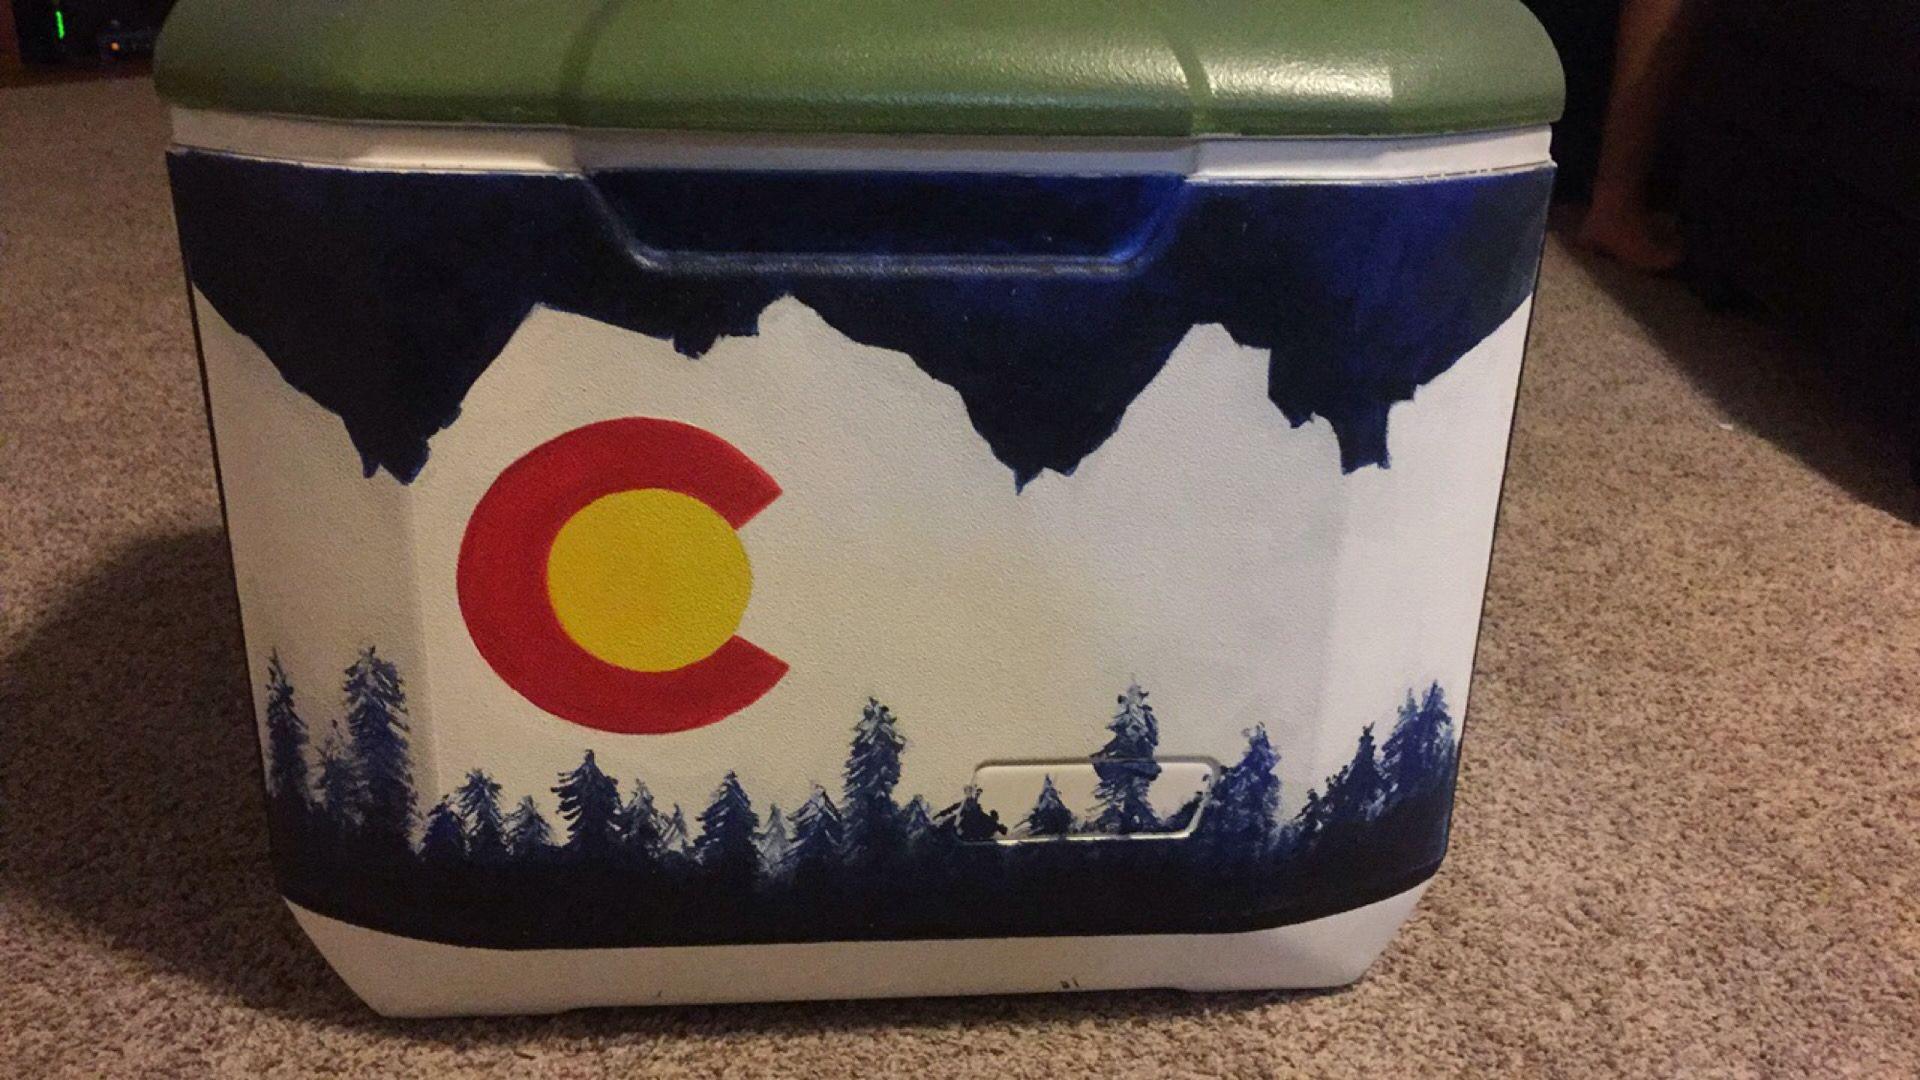 Cooler for boyfriend, Colorado